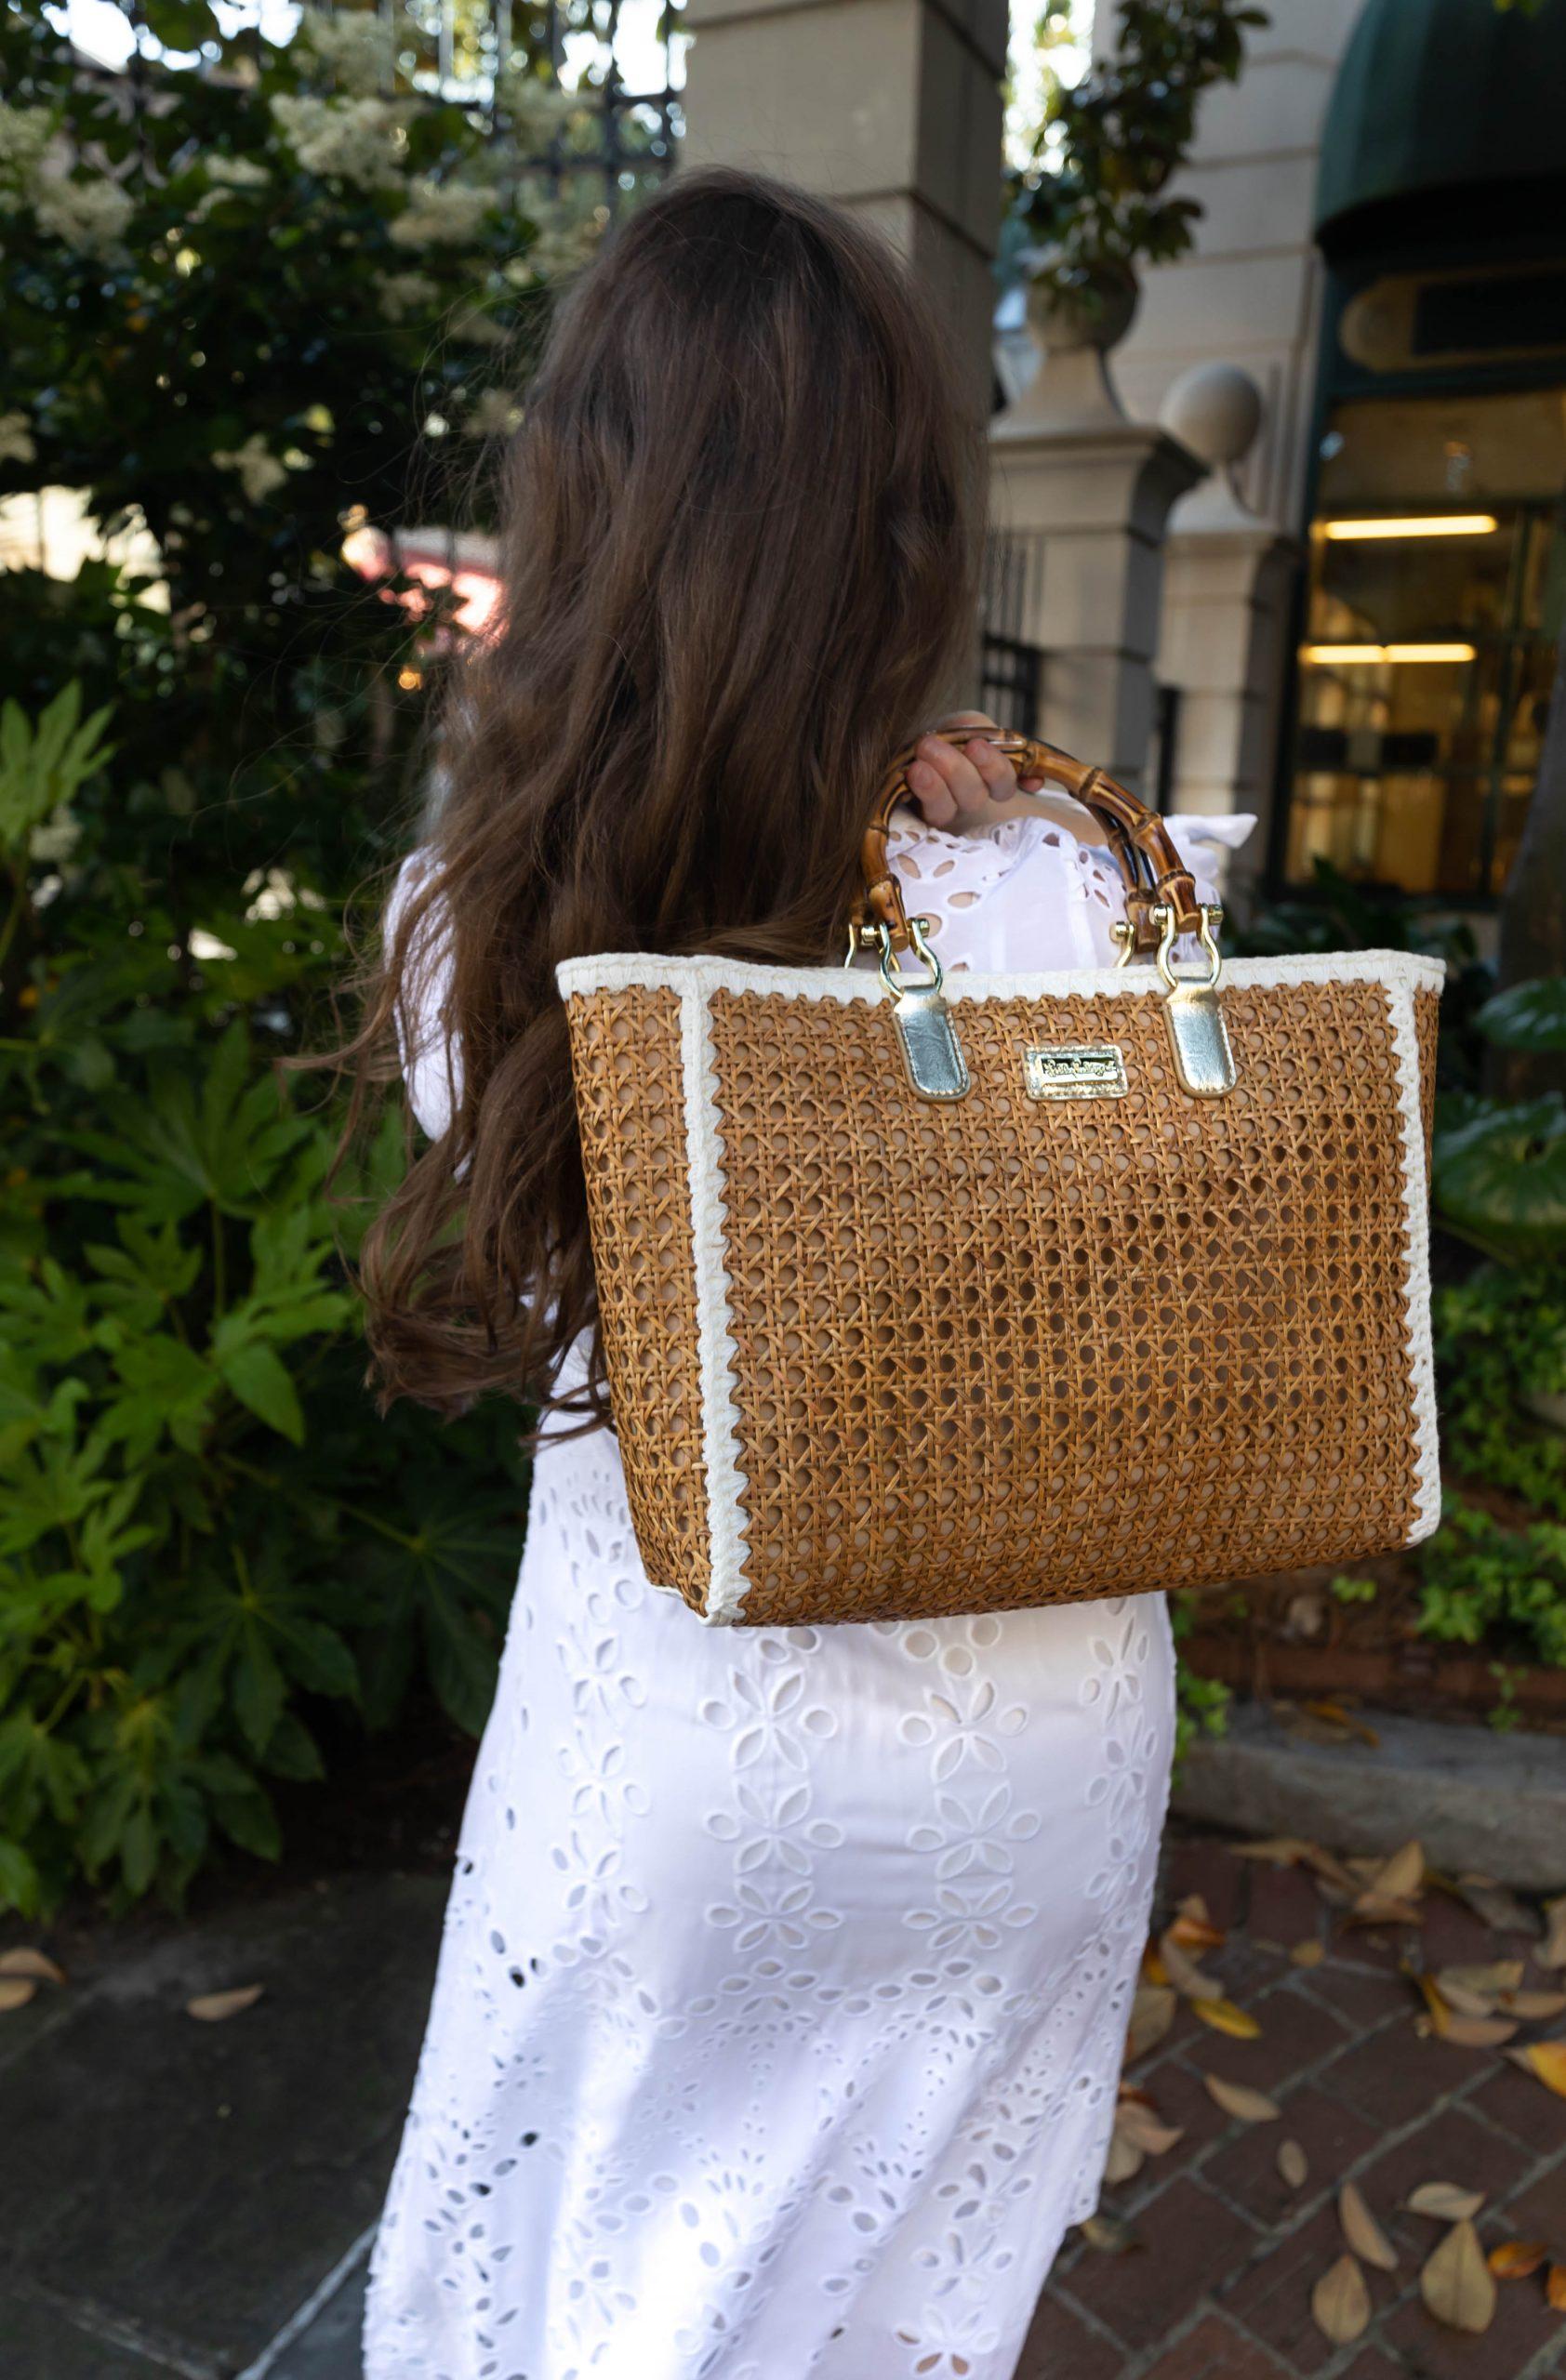 Lilly Pulitzer Amrita Eyelet Midi Dress and Cane Tote Bag Styled by Annie Fairfax in Charleston South Carolina